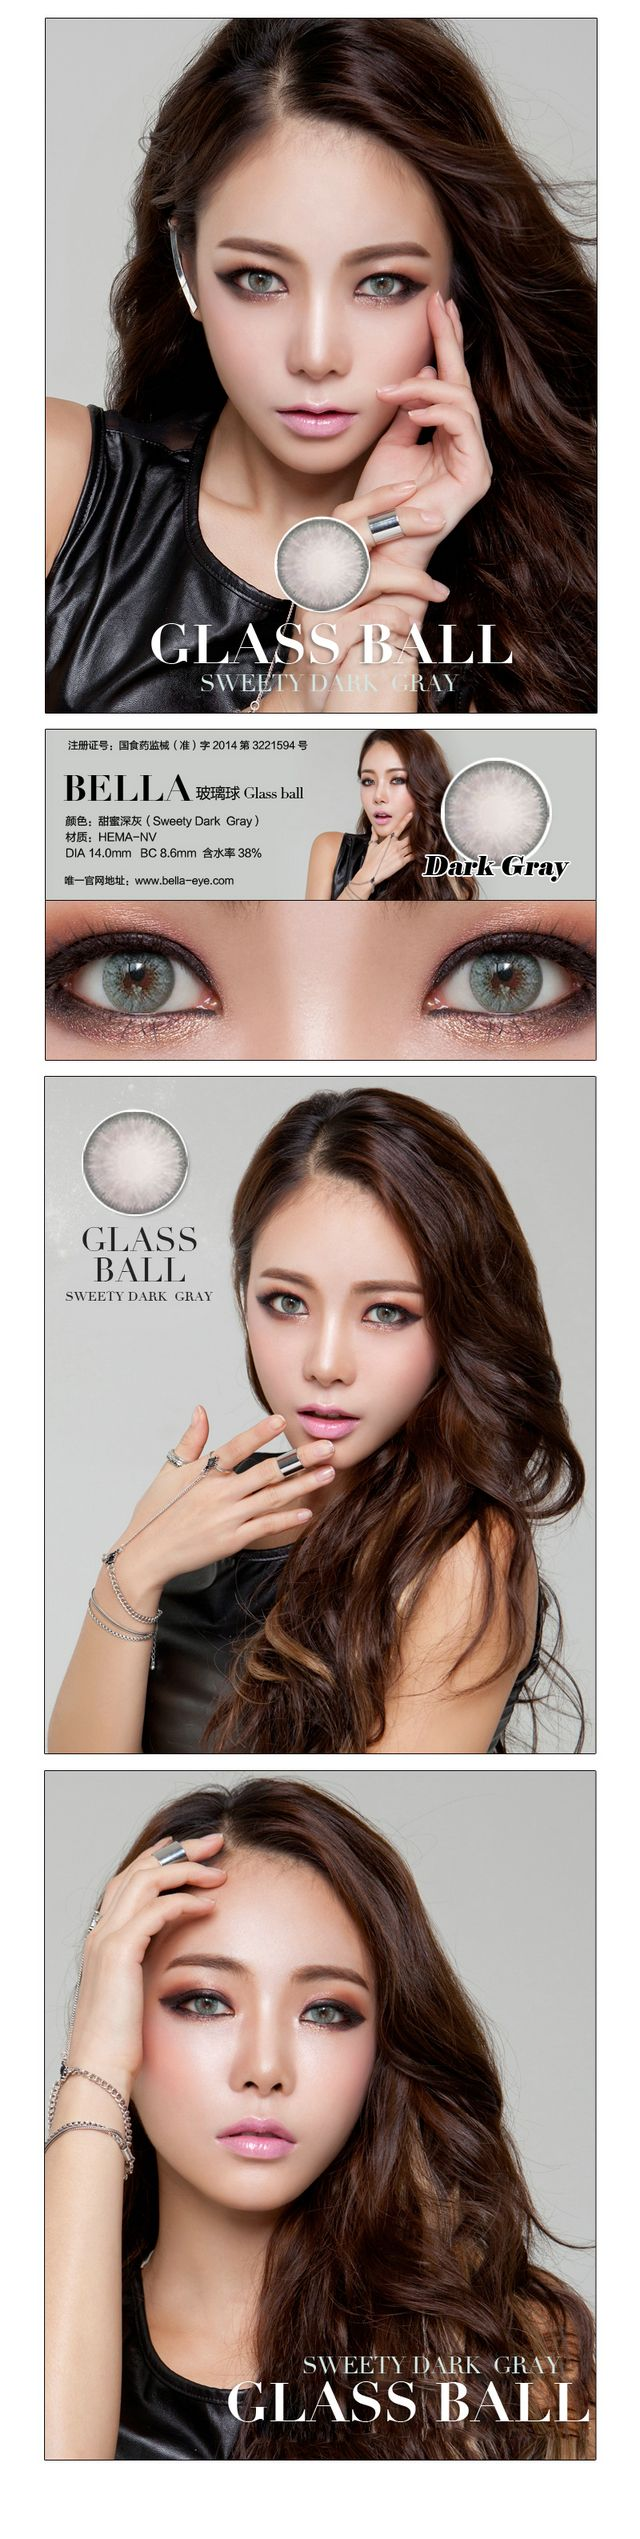 Color contact lenses online shop - 14 00mm Bella Glass Ball Contact Lens Color Dark Gray 16 99 Contactlensdropshipping Com